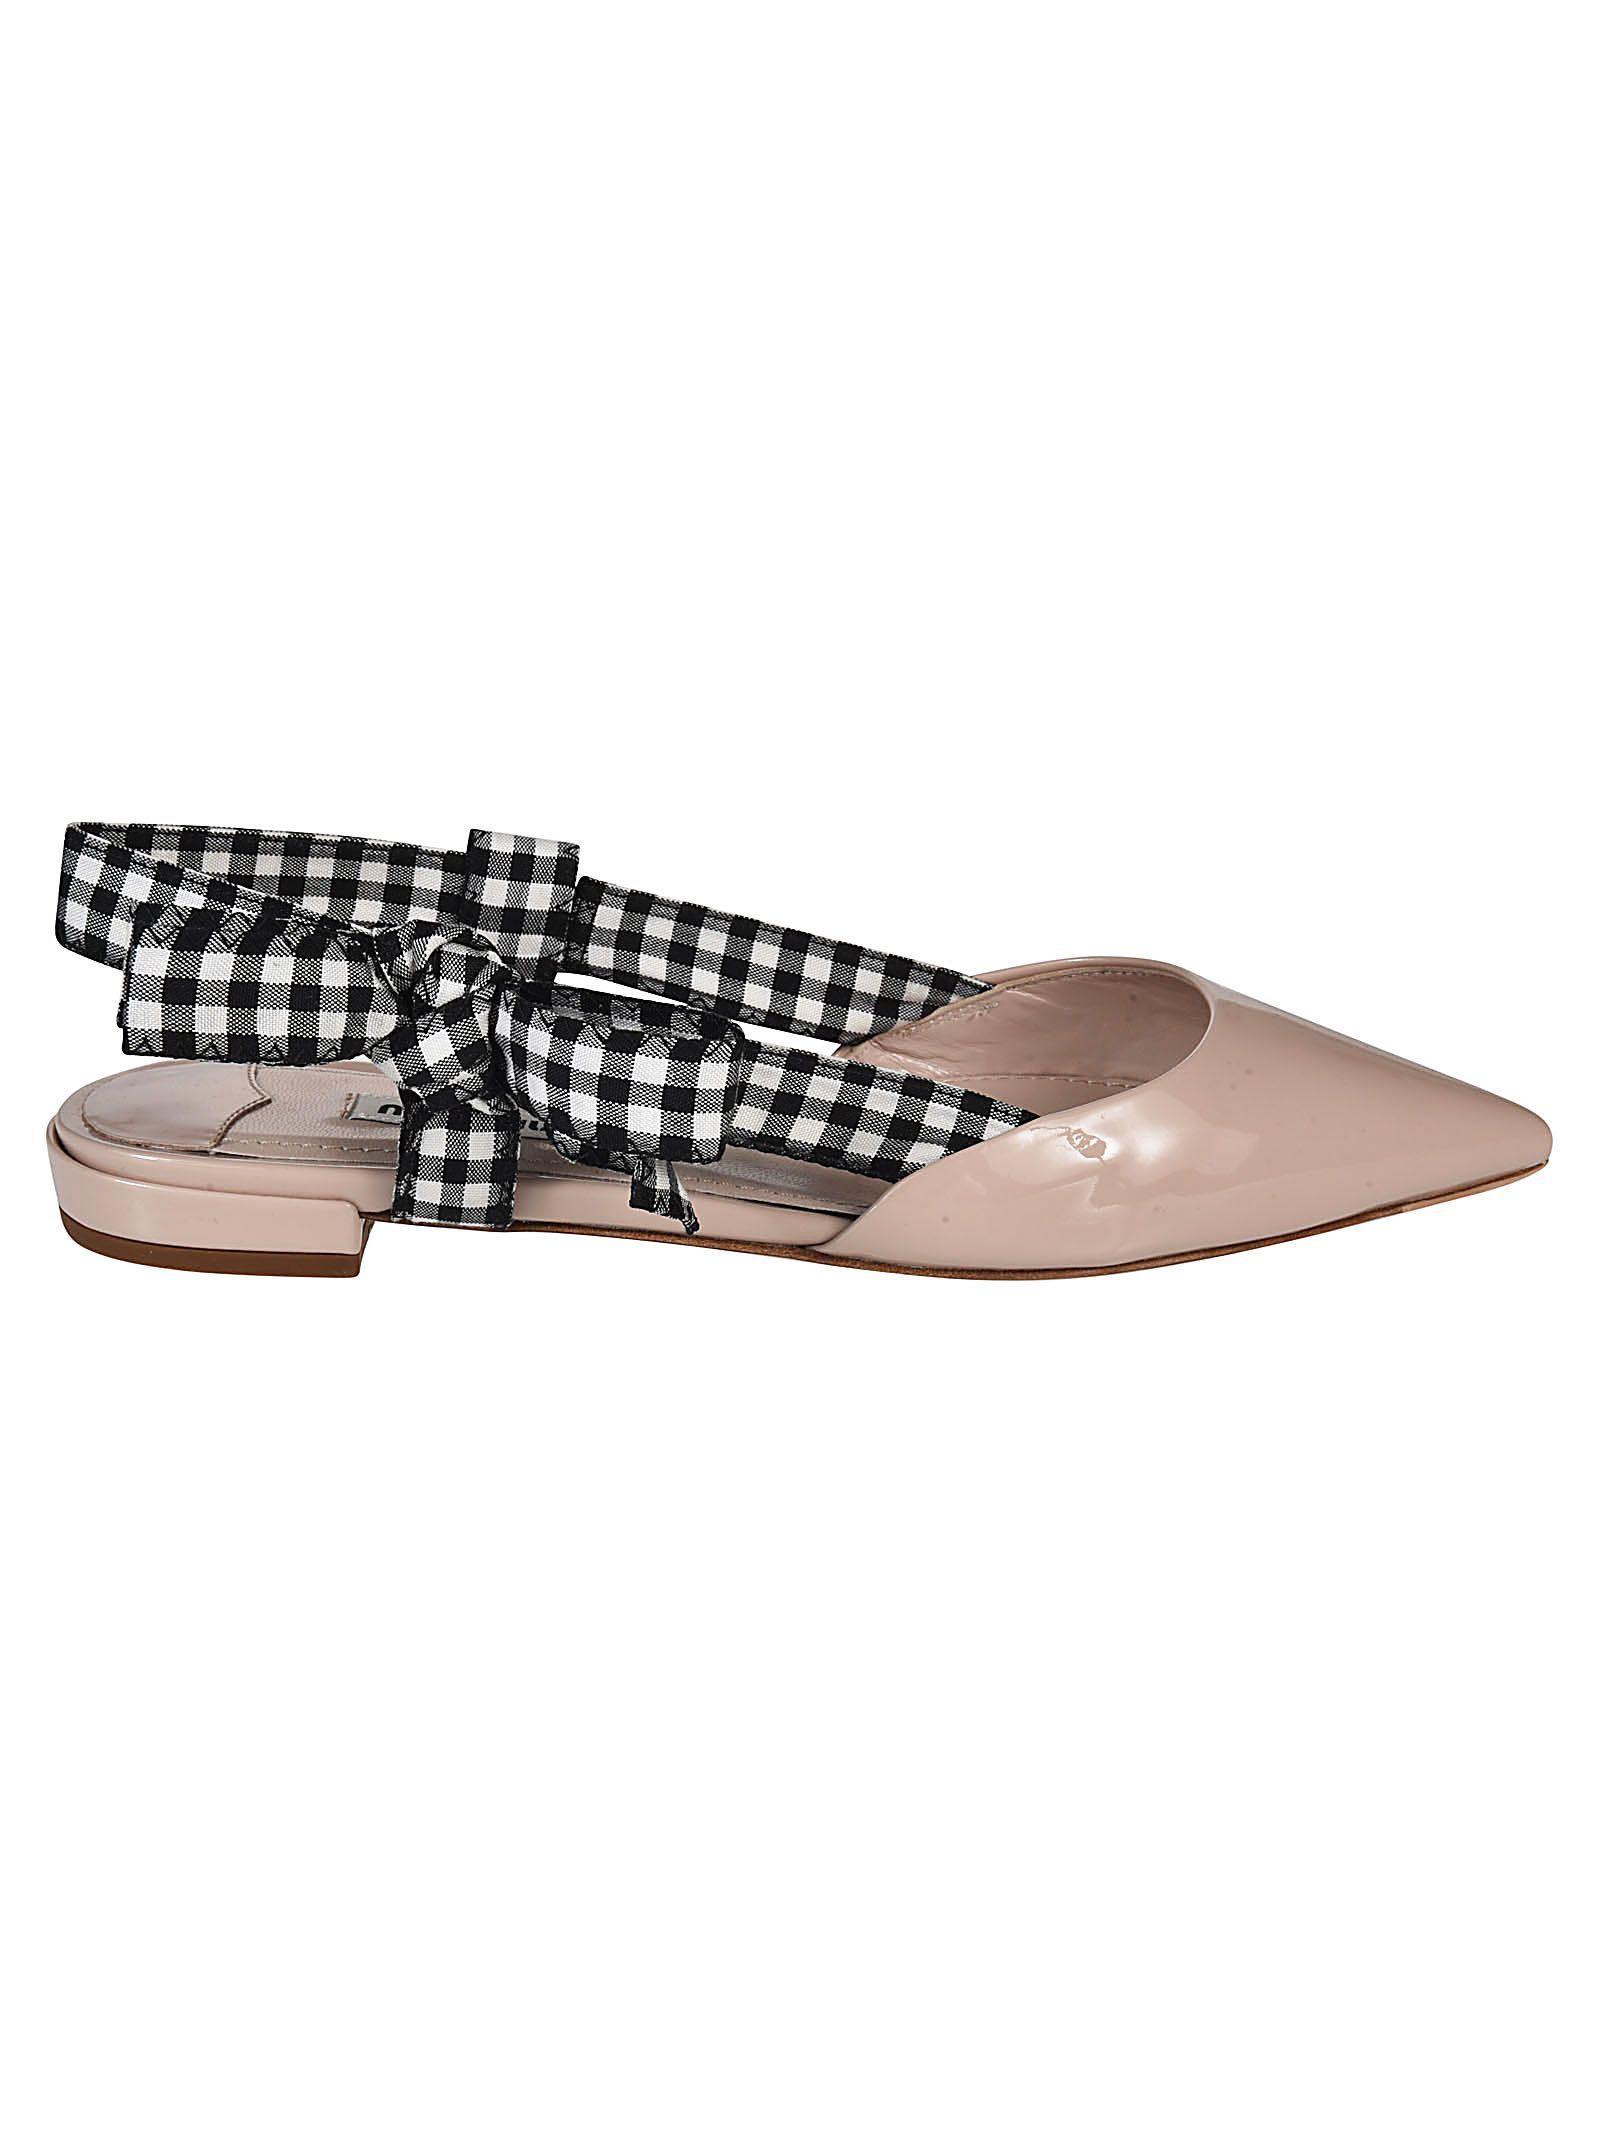 ddf5bc04437 Low Heels · Leather · MIU MIU SLINGBACK CHECKED PUMPS.  miumiu  shoes    Teen Girl Fashion